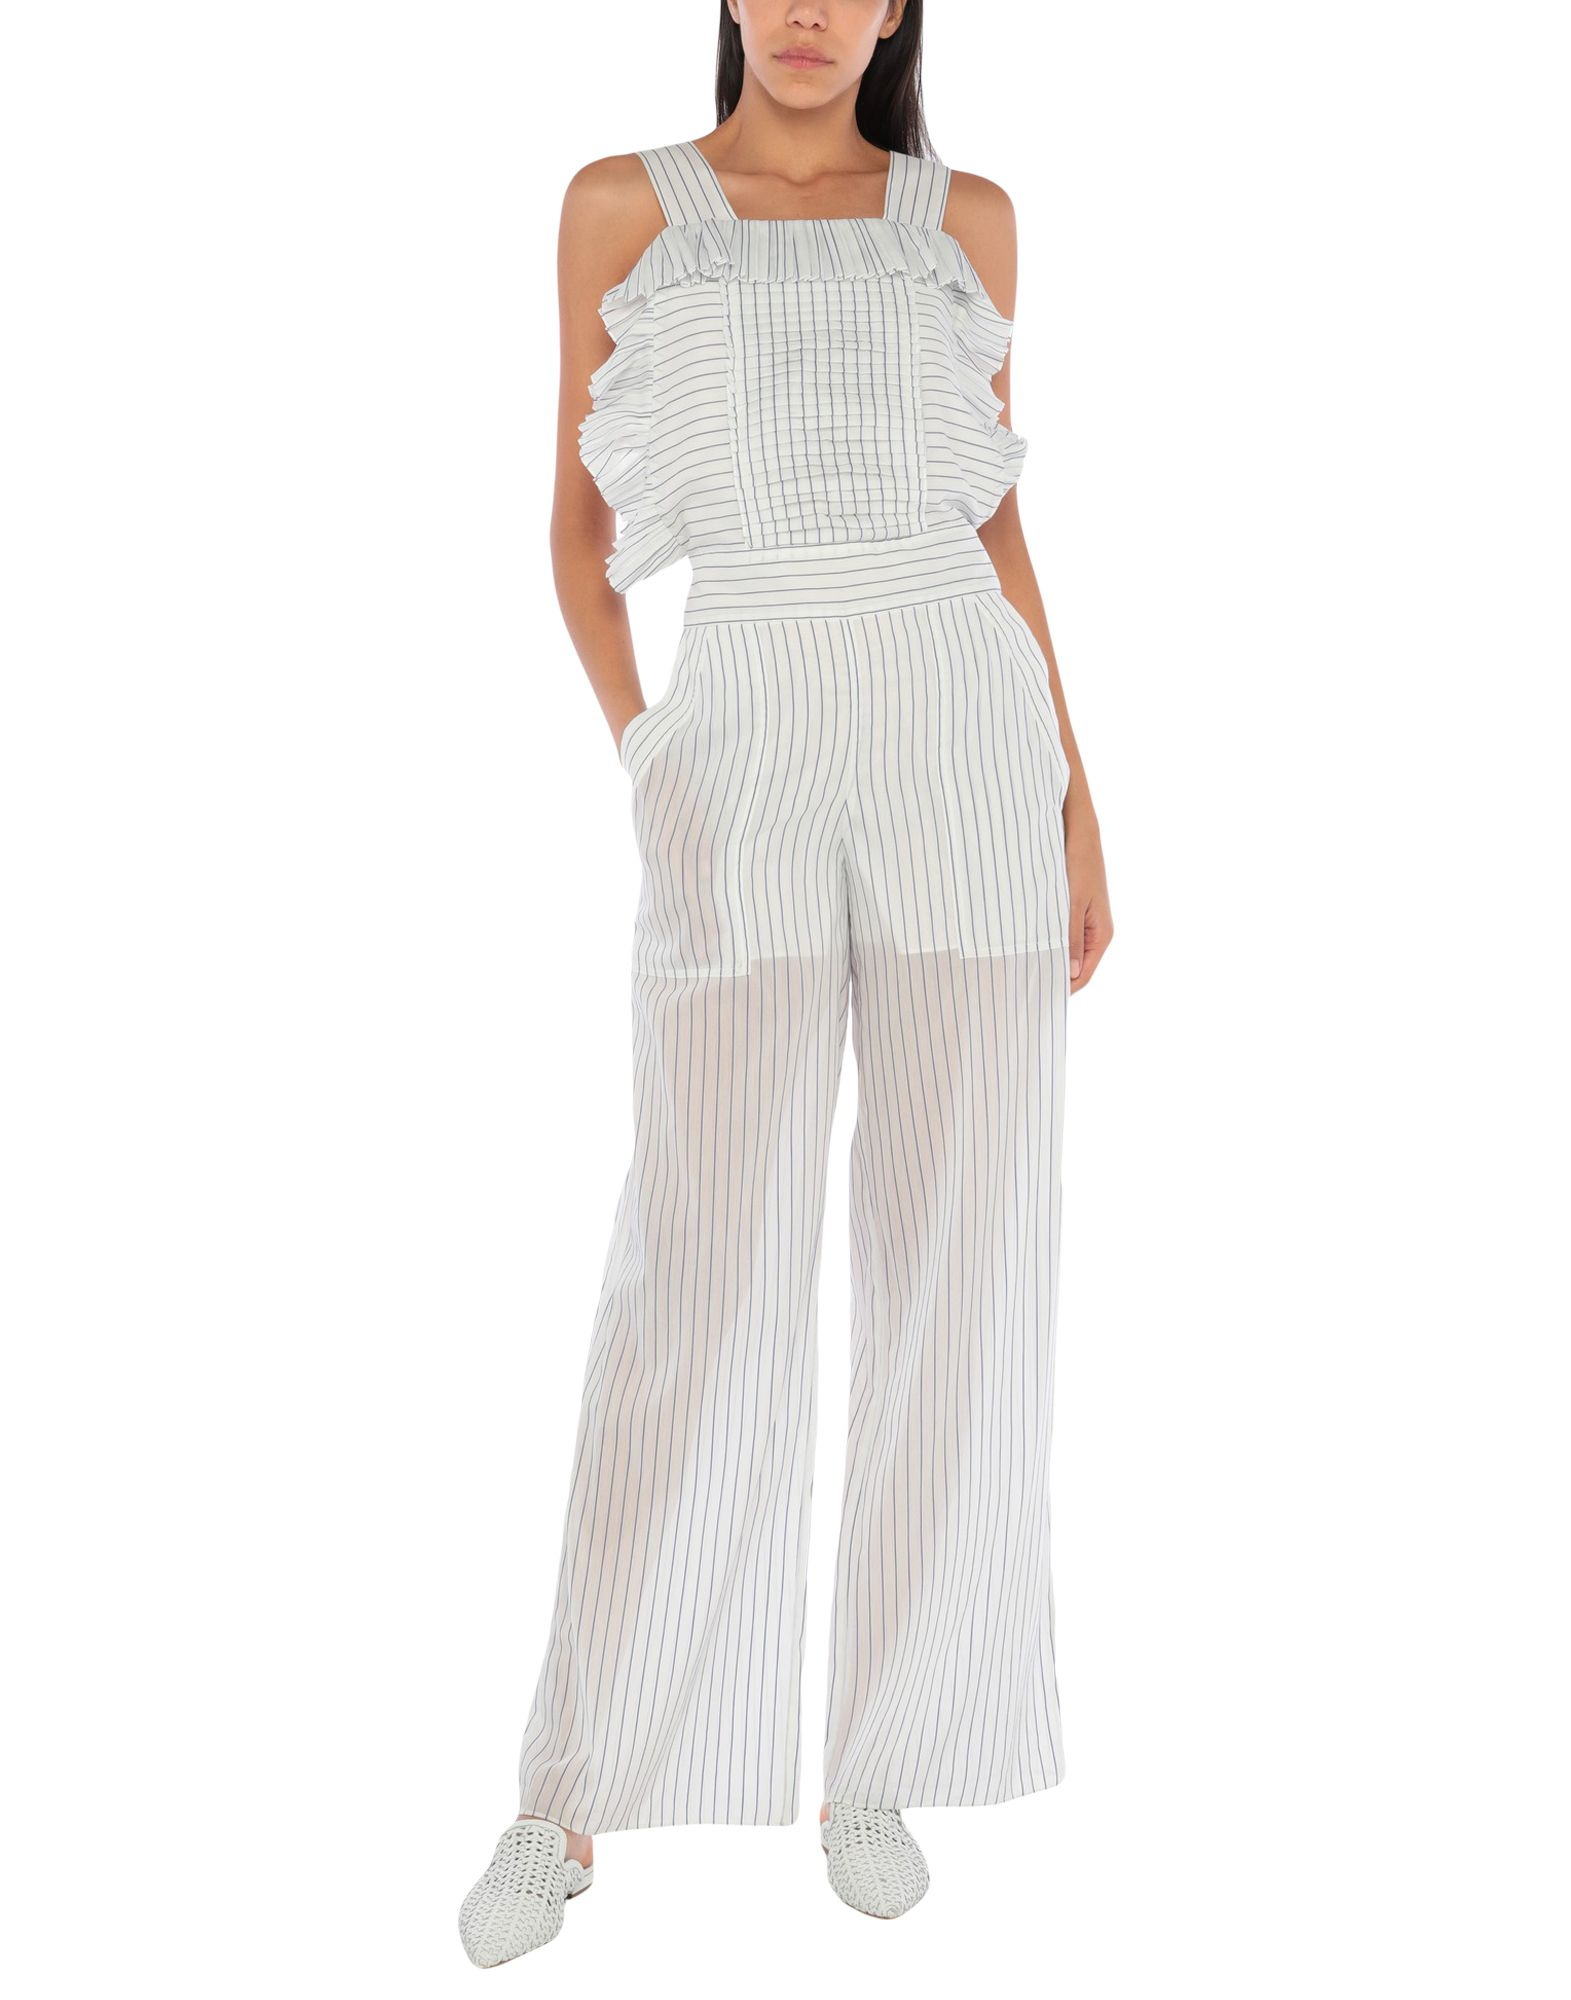 PHILOSOPHY di LORENZO SERAFINI Overalls. plain weave, pleated, ruffles, folds, stripes, overalls top, sleeveless, multipockets, zip, side closure, mid rise, semi-lined. 77% Cotton, 23% Silk